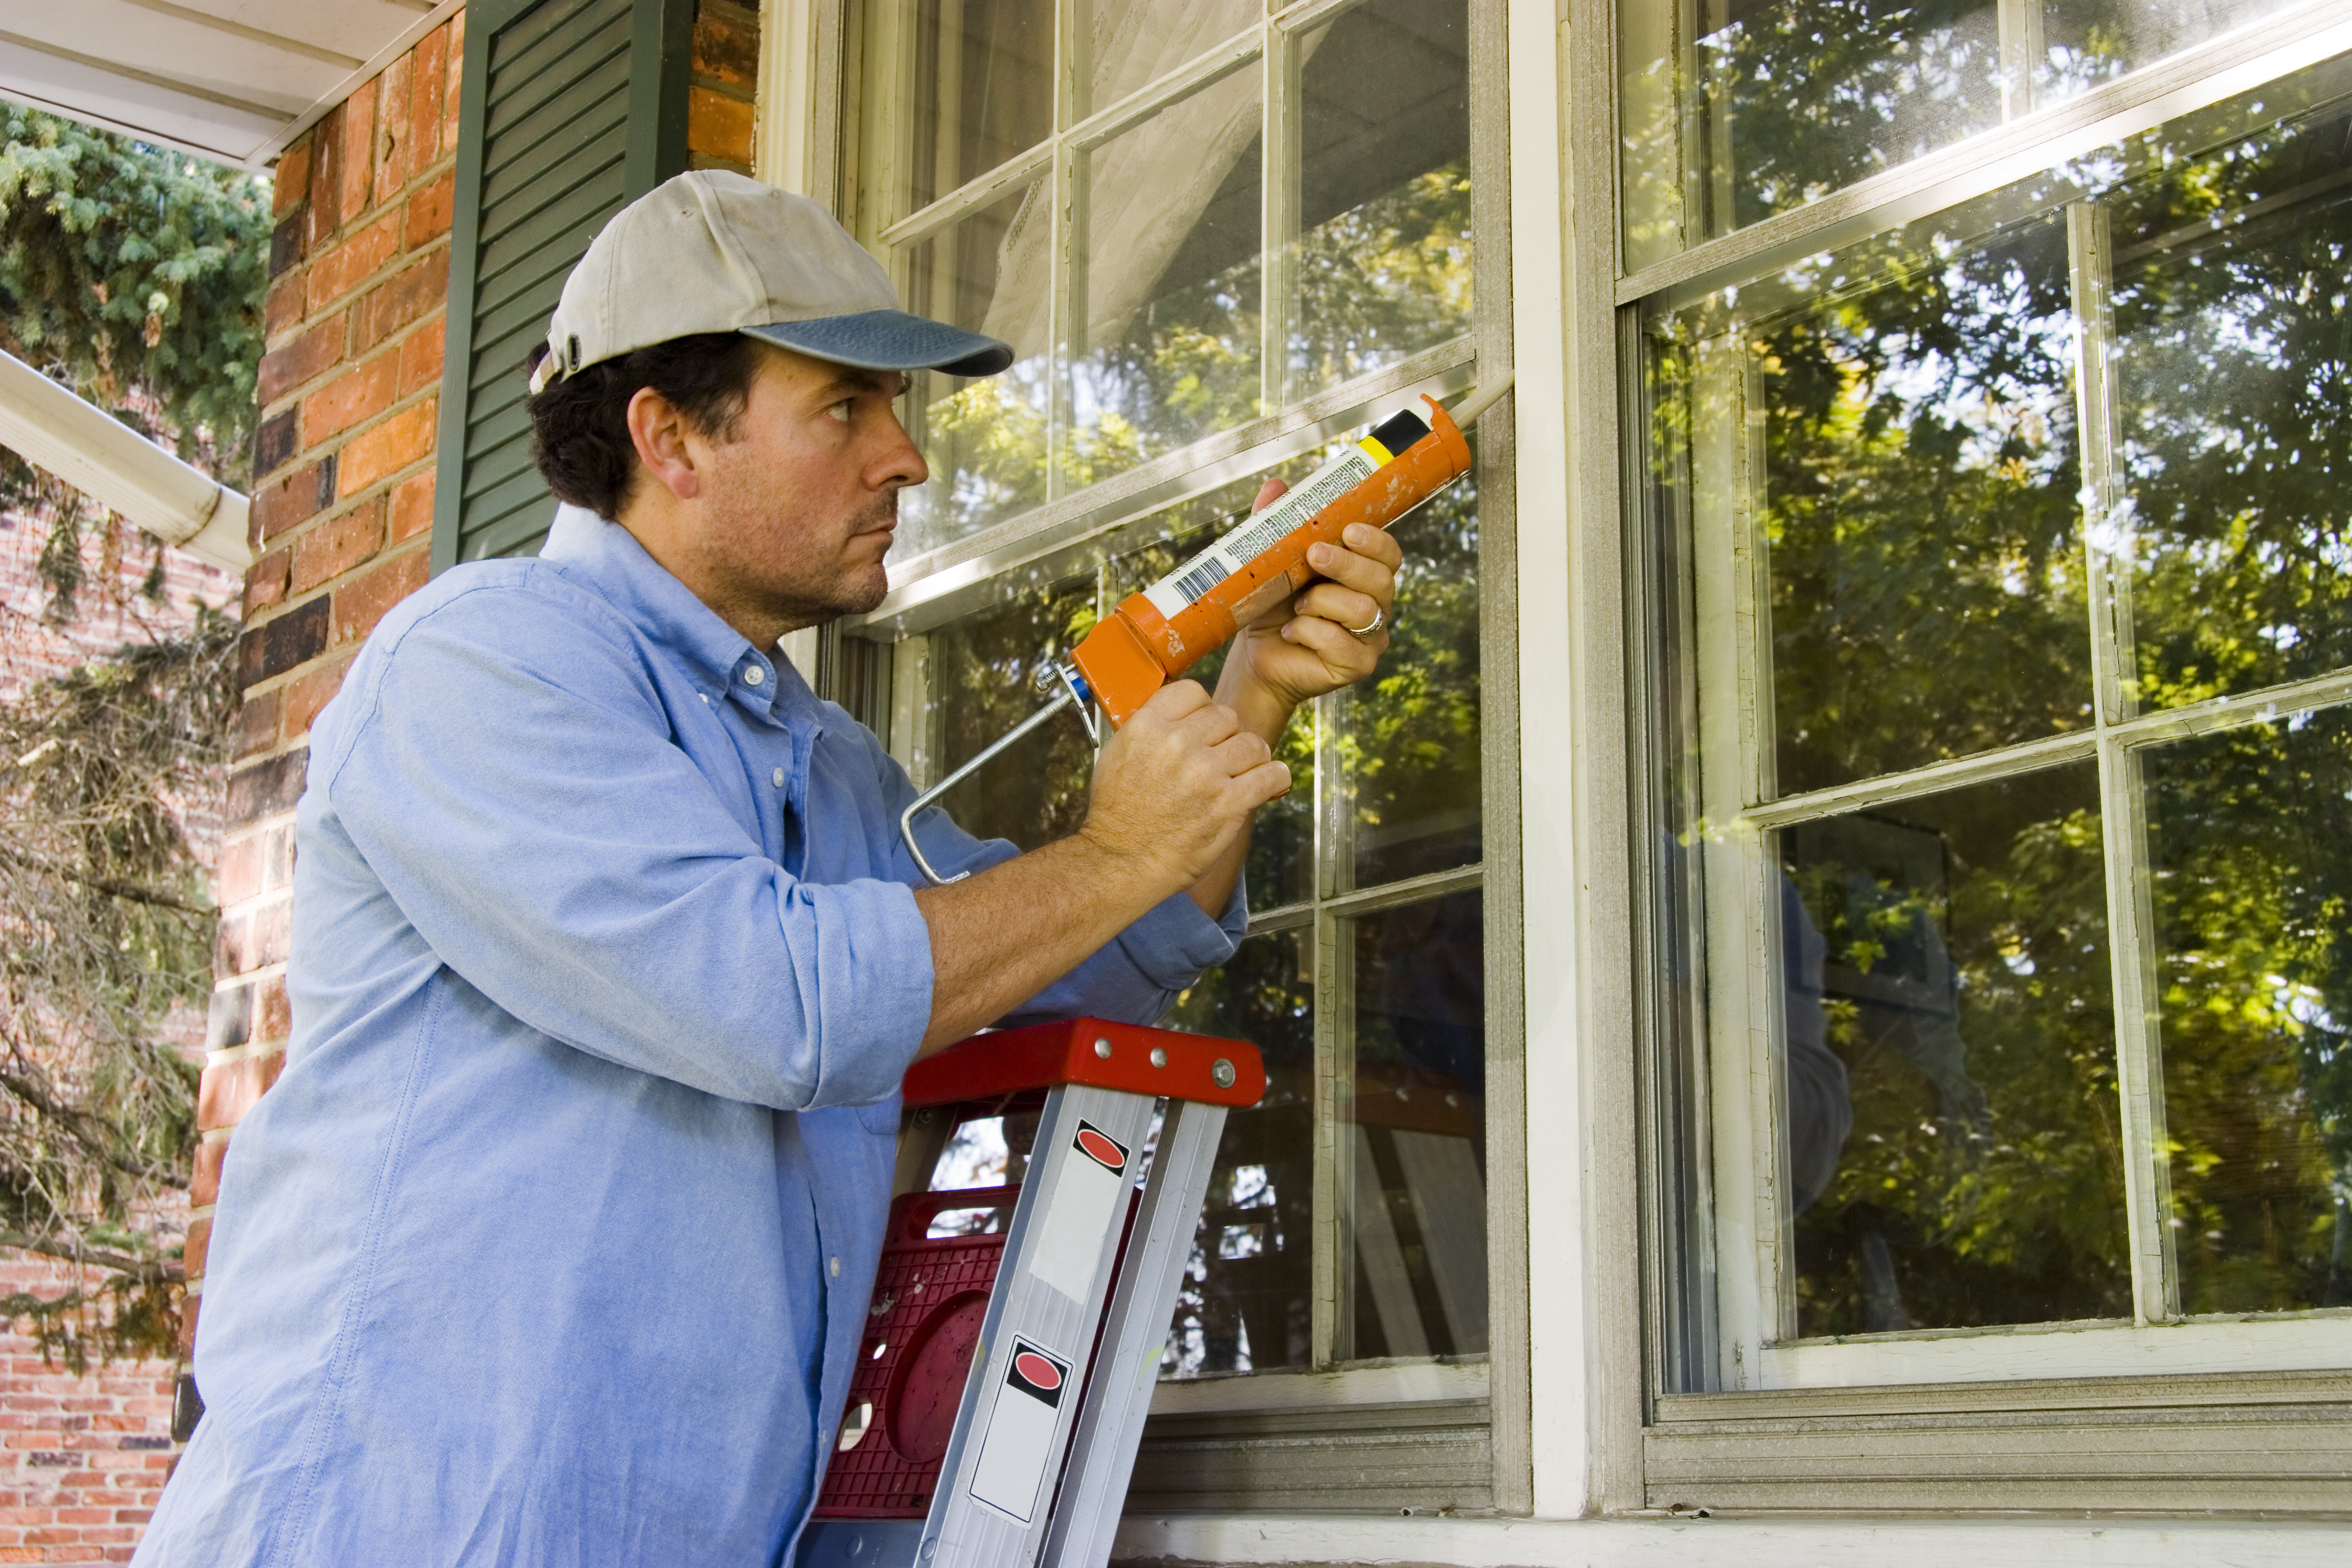 Man Caulking & Weather Stripping WIndow for Rental Property